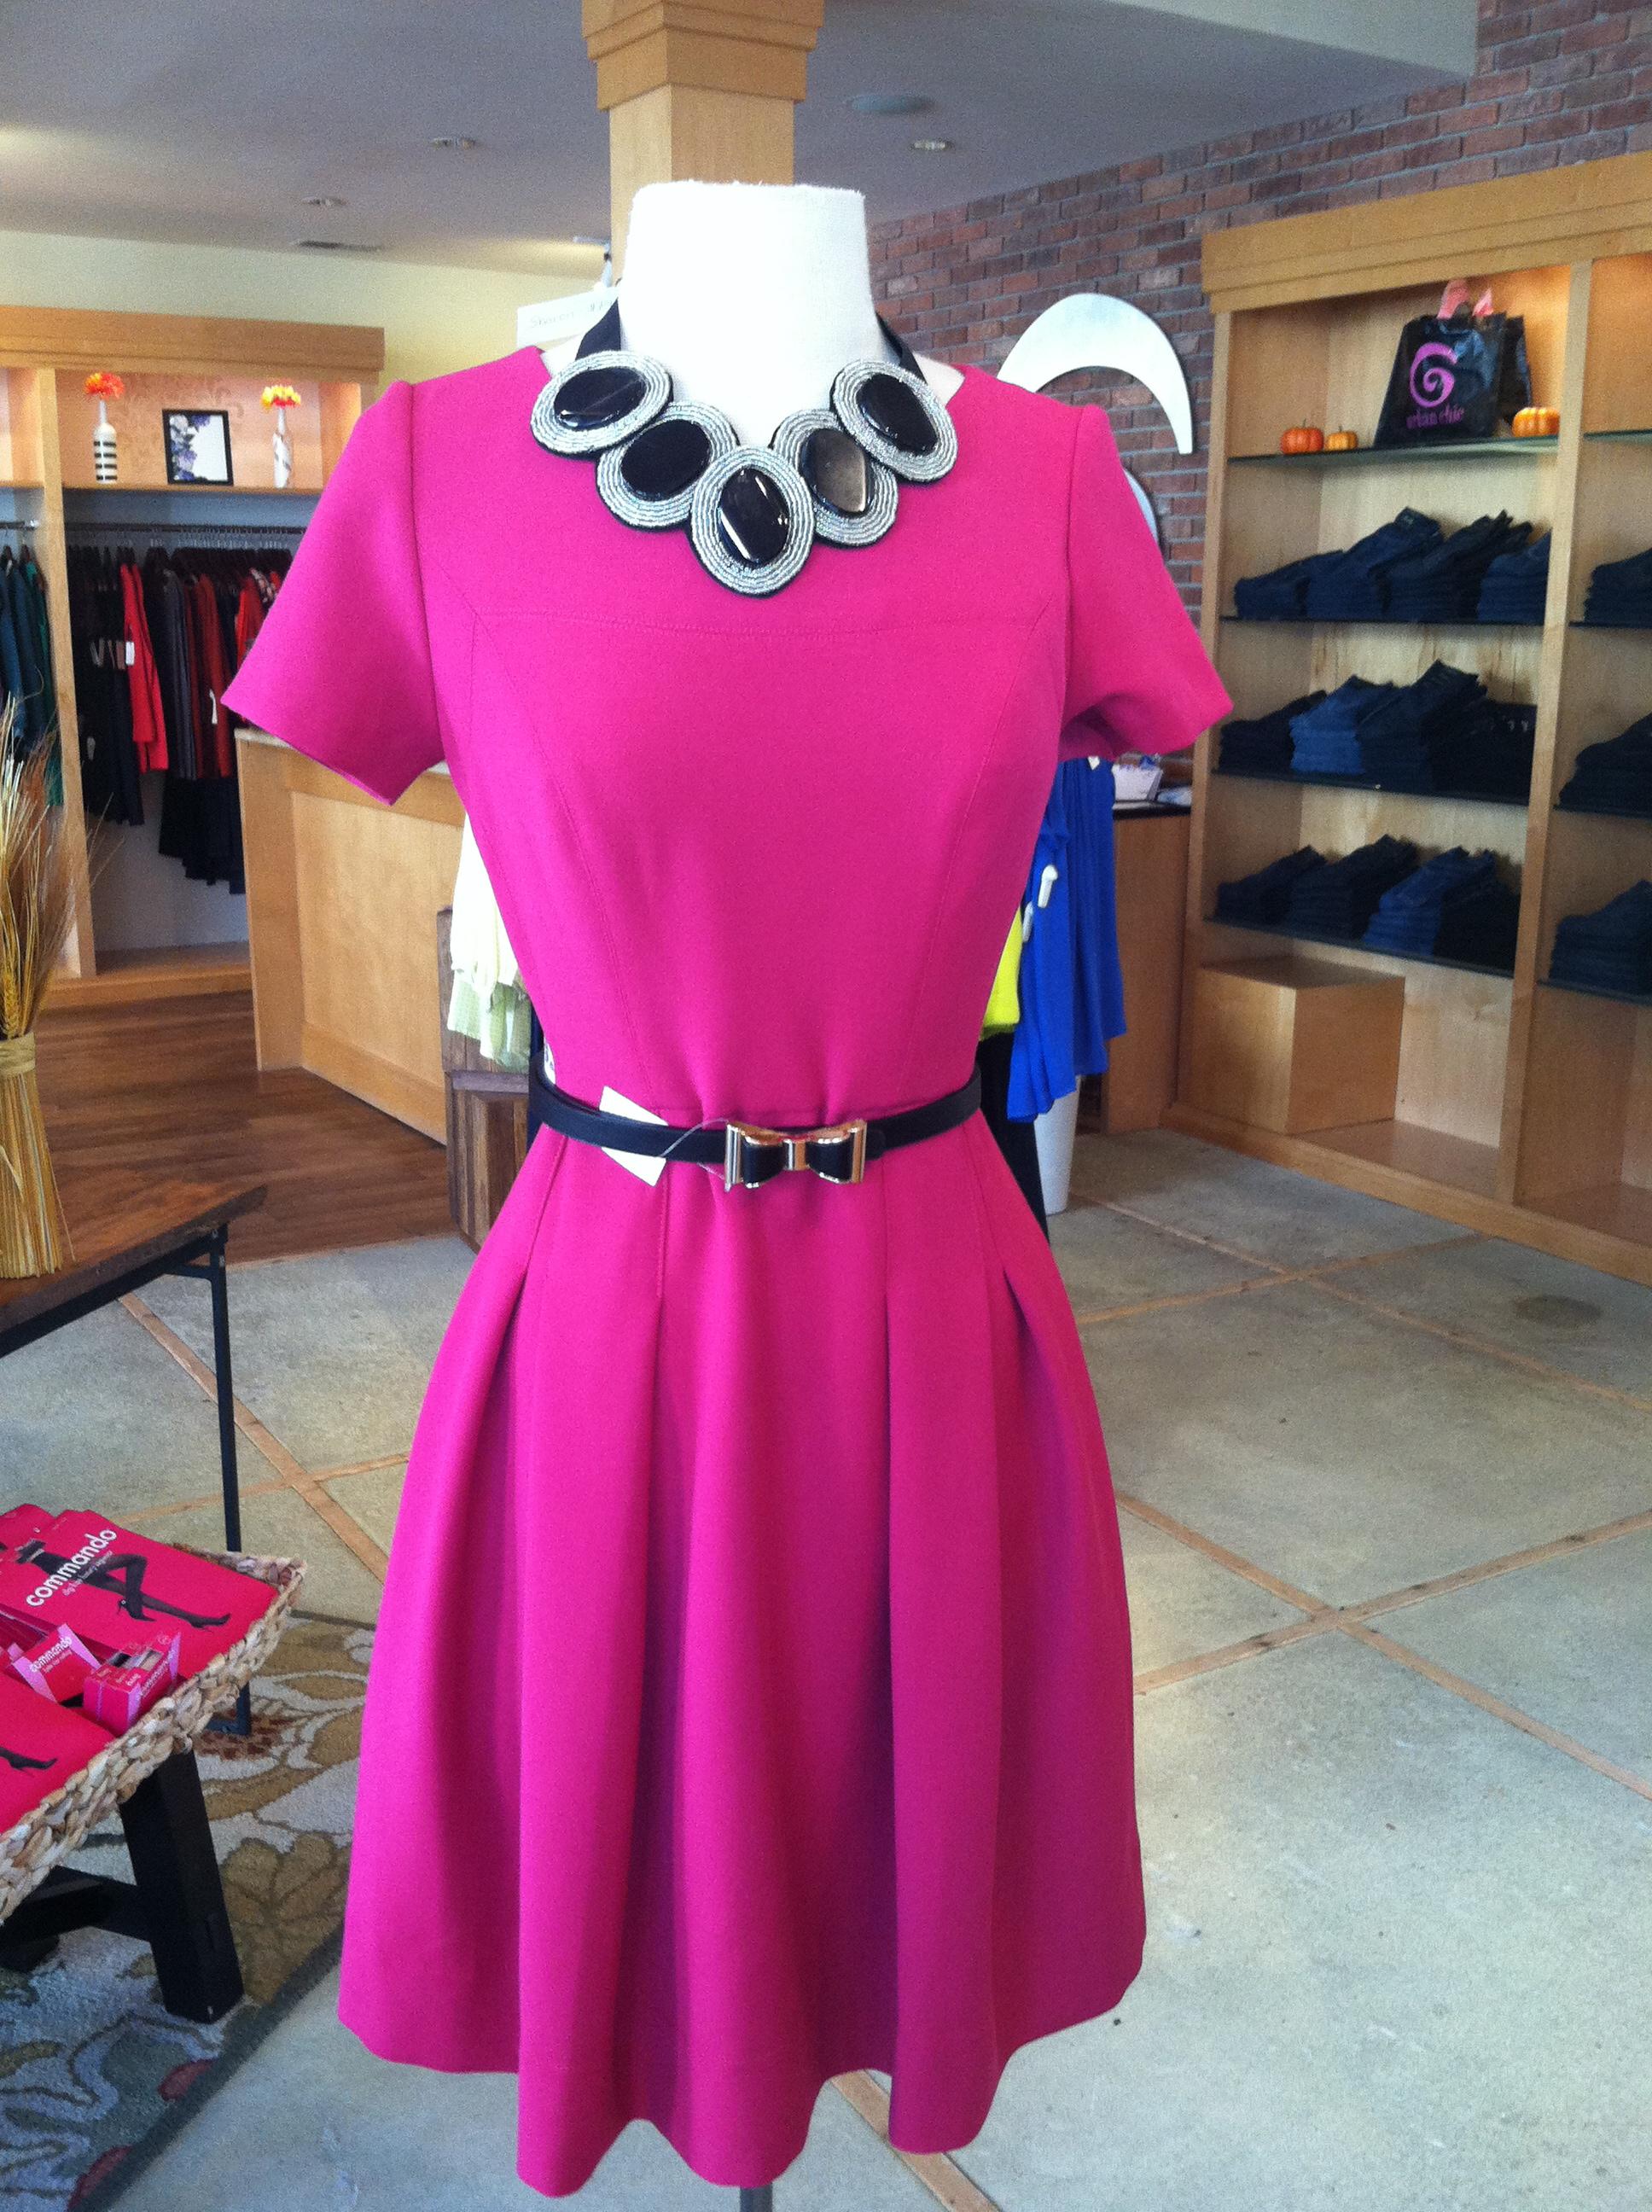 Shoshanna Dresses Josephine Gallery Shoshanna Cassidy Dress in